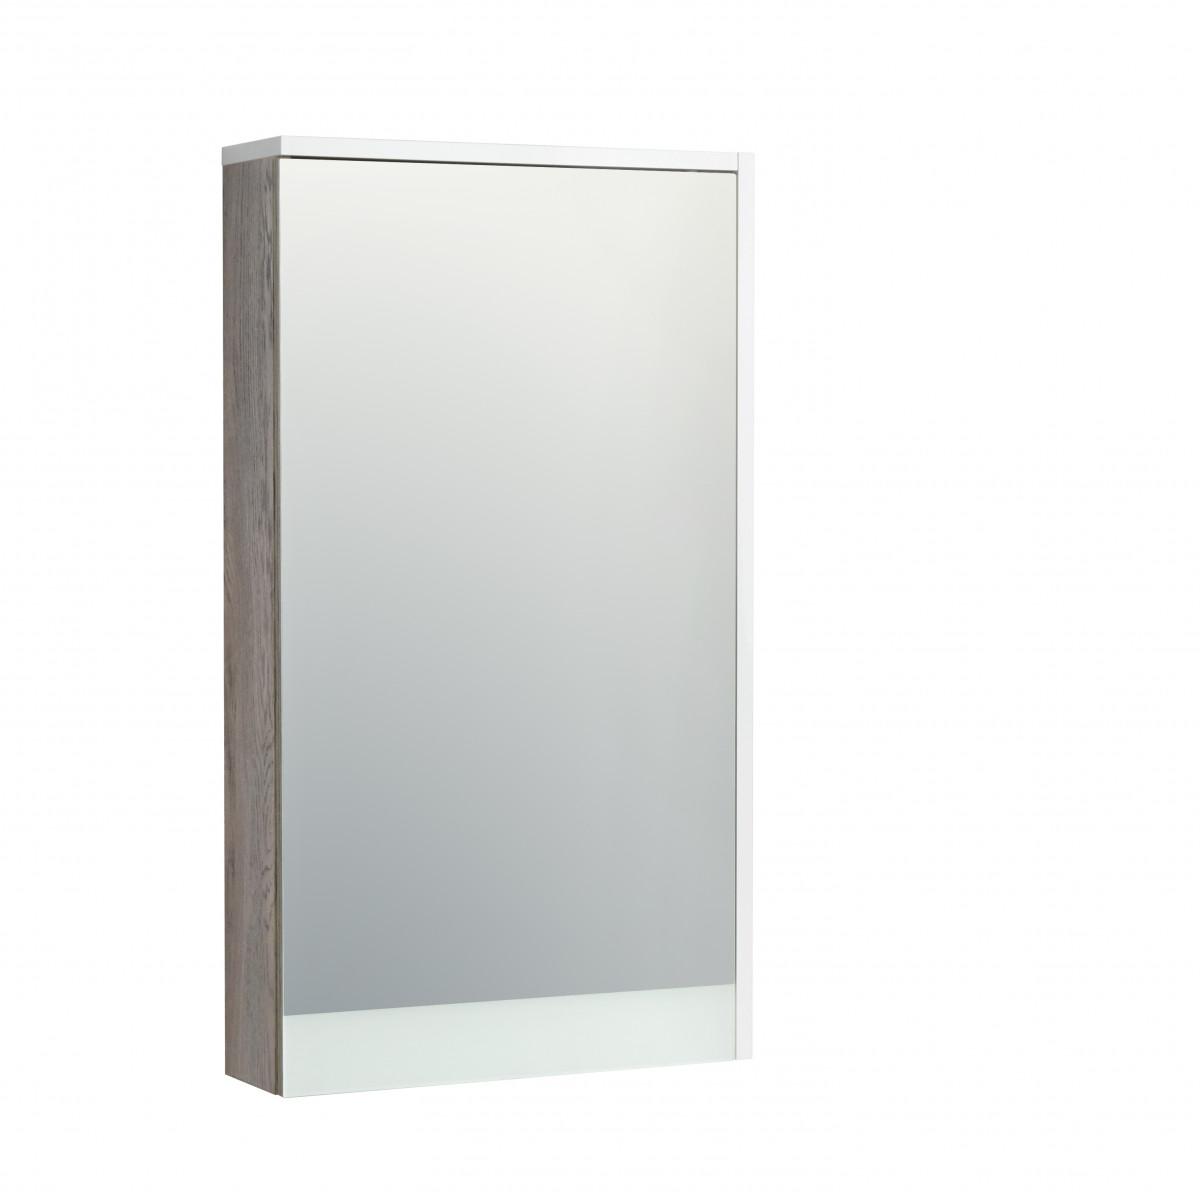 Зеркальный шкаф Акватон Эмма, 1A221802EAD80, 46 х 82 см